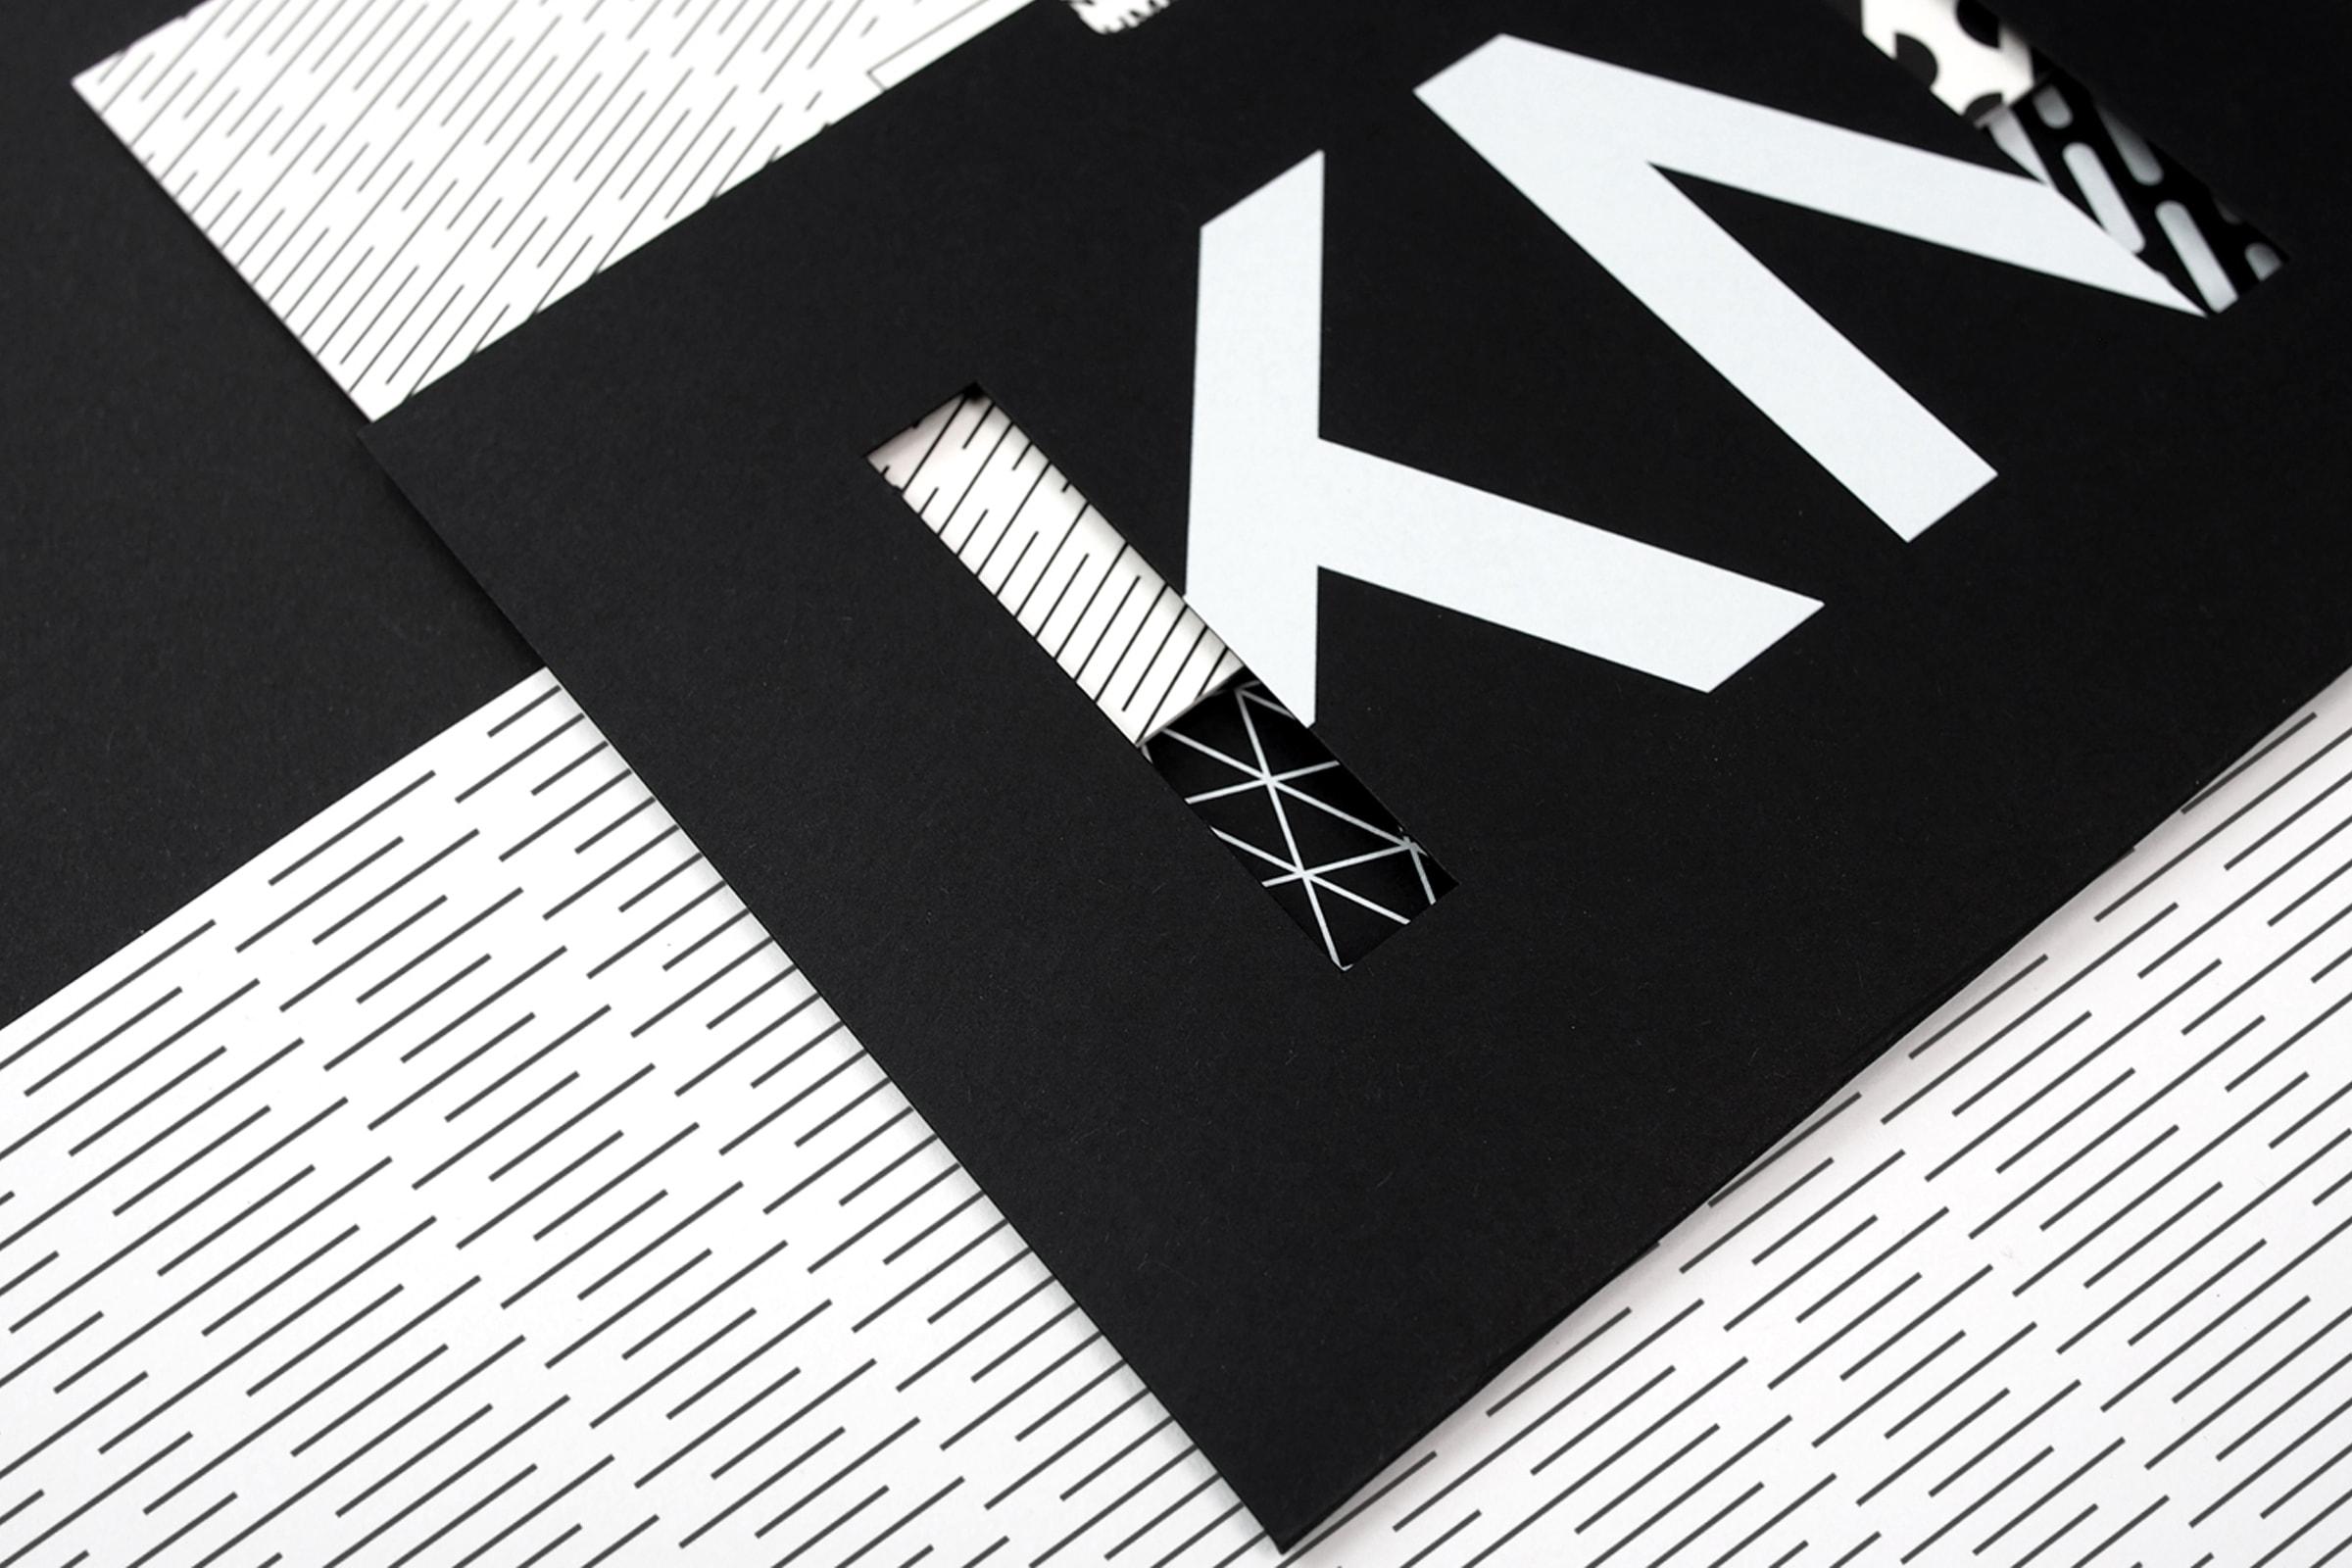 KieferNümann, Mailing, Illustration, Pattern